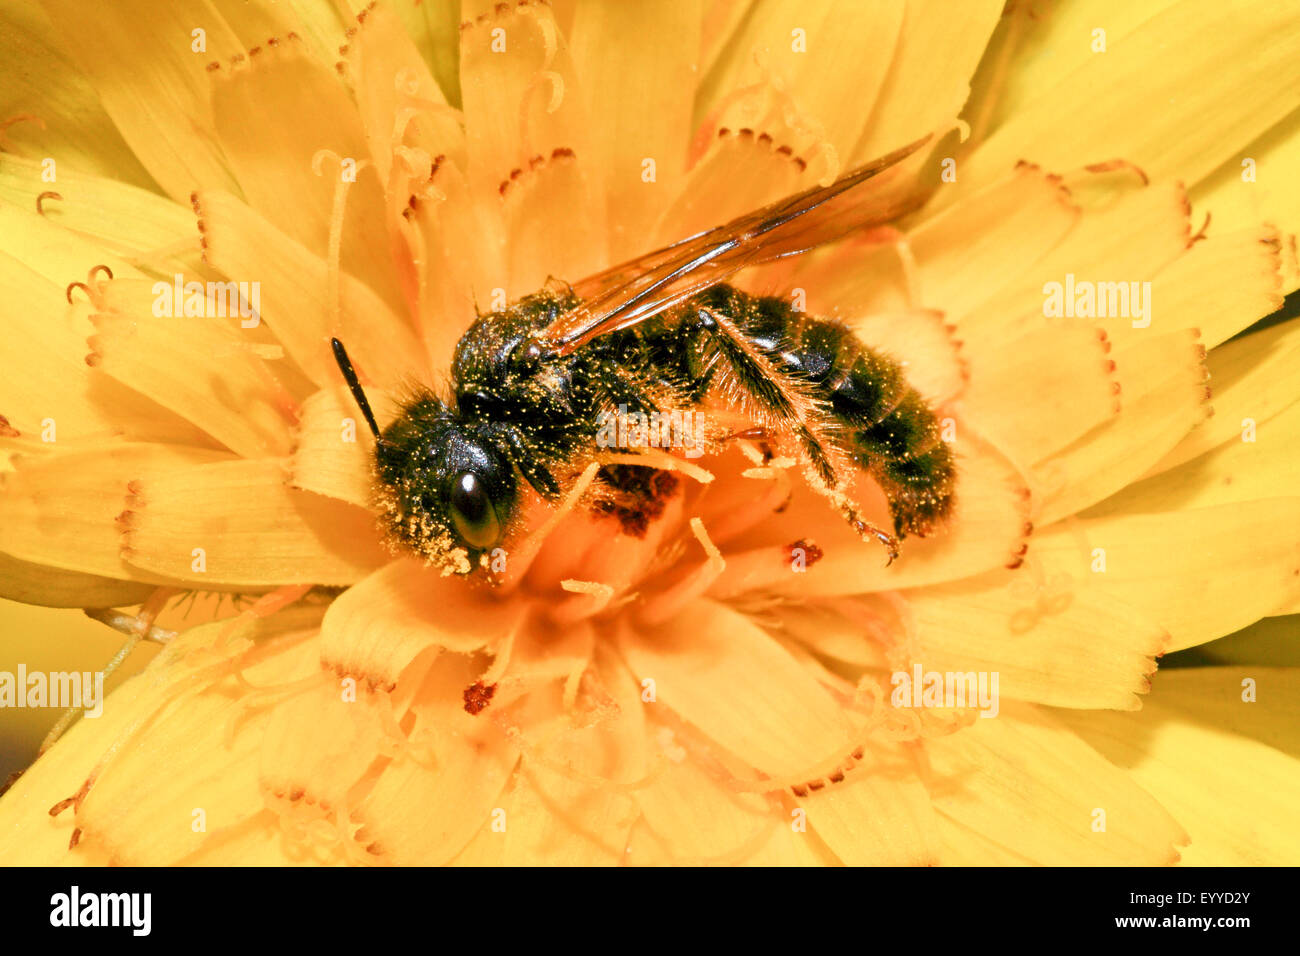 Hairy Panurgus (Panurgus banksianus, Panurgus banksiana), collects pollen in a flower, Germany Stock Photo